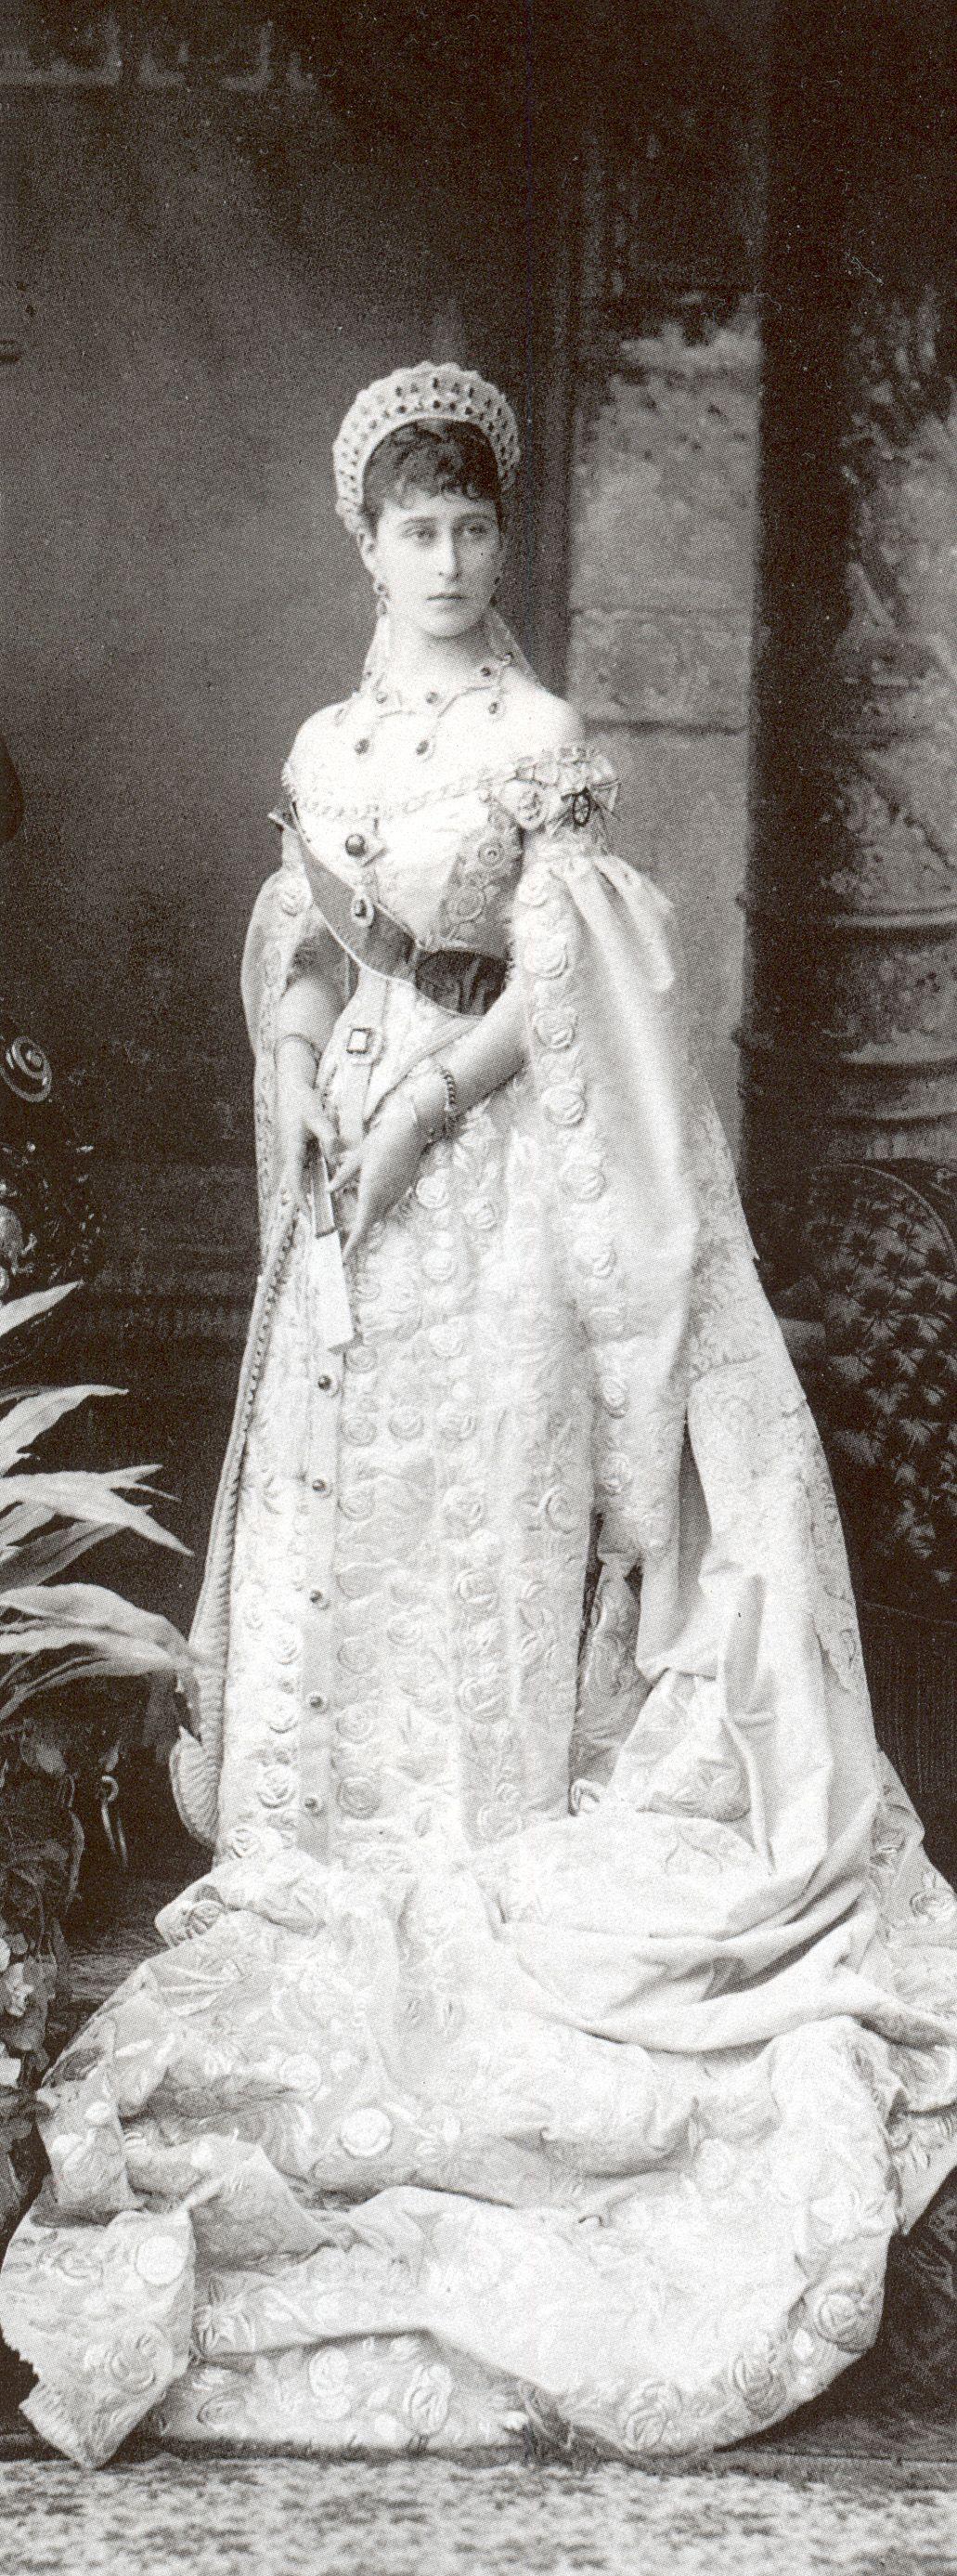 Grand duchess elizabeth feodovna in full russian court dress a good